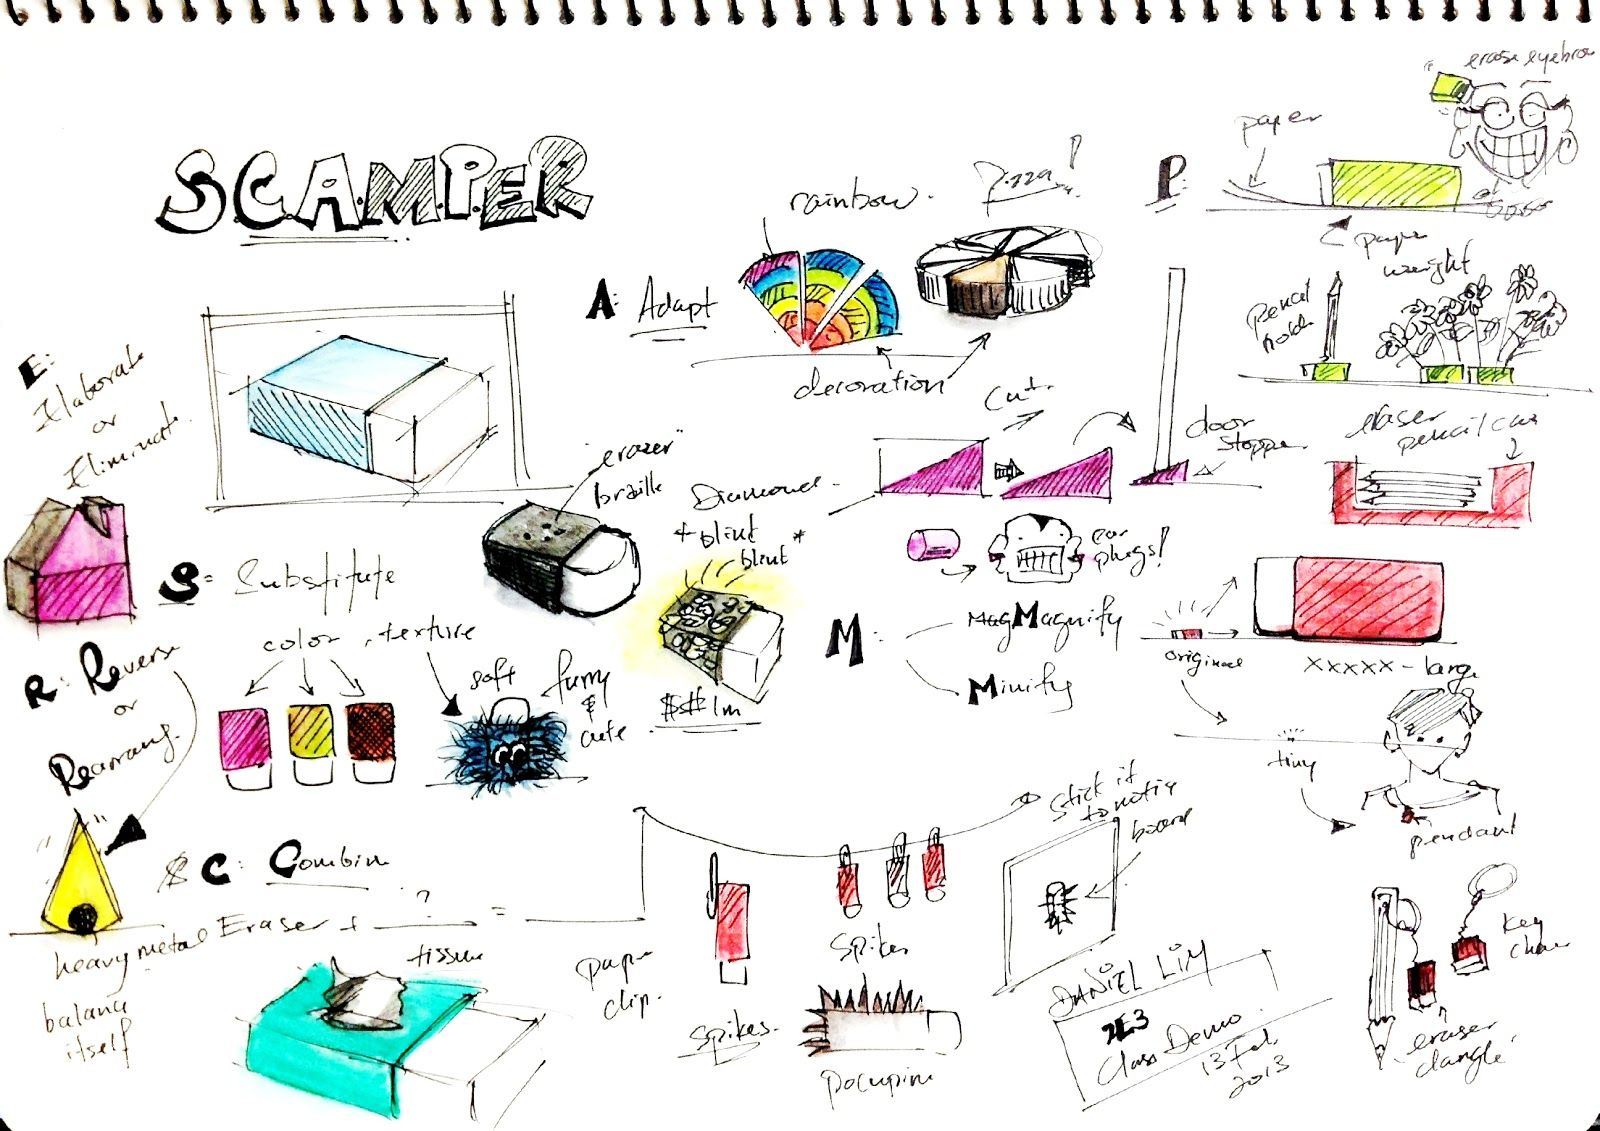 Scamper Designjournalsosspot 01 01 Archive